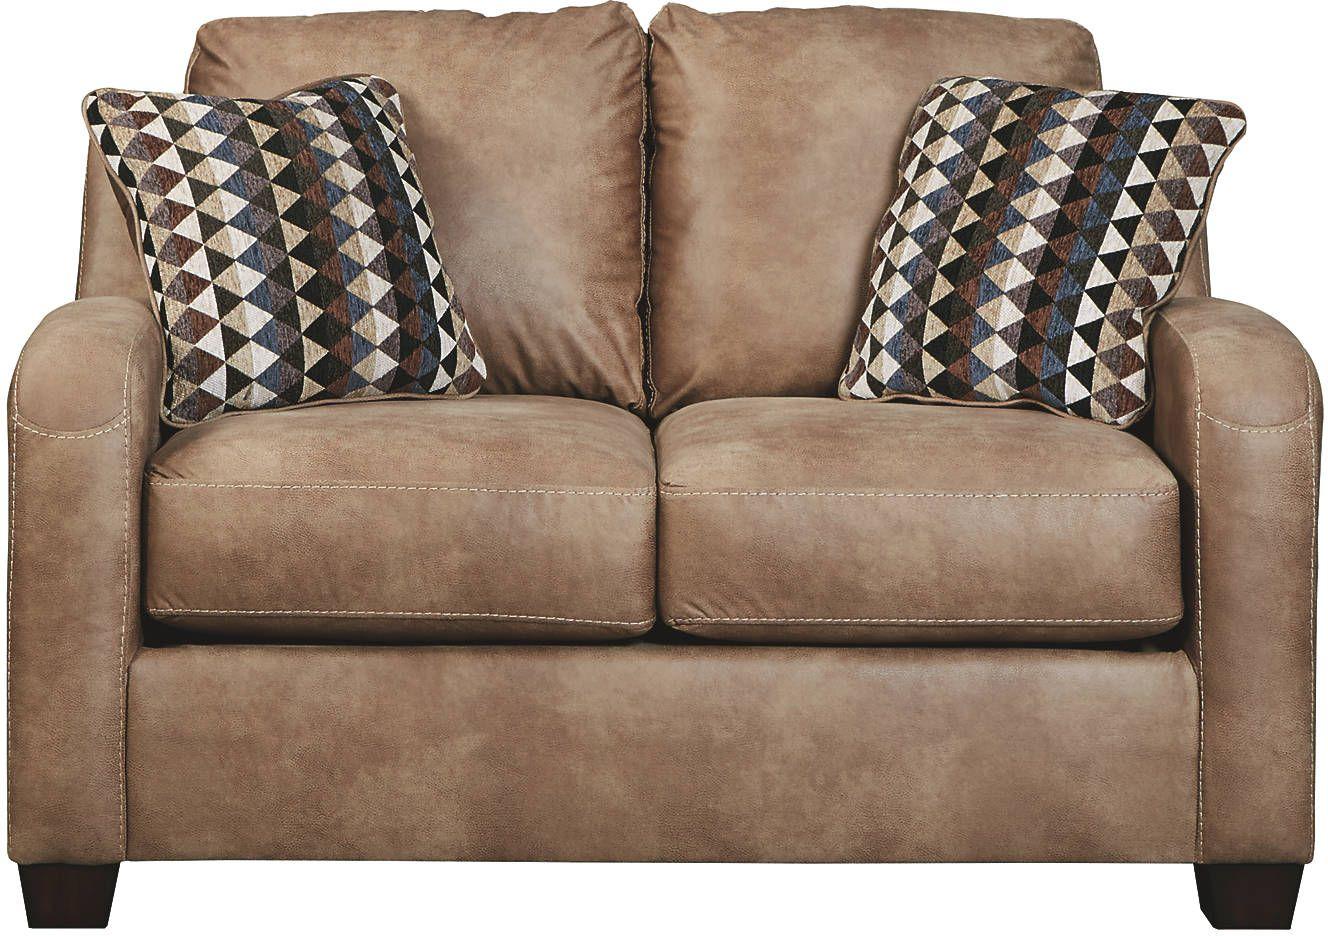 Cool Benchcraft Alturo Dune Loveseat 6000335 Peoples Furniture Beatyapartments Chair Design Images Beatyapartmentscom